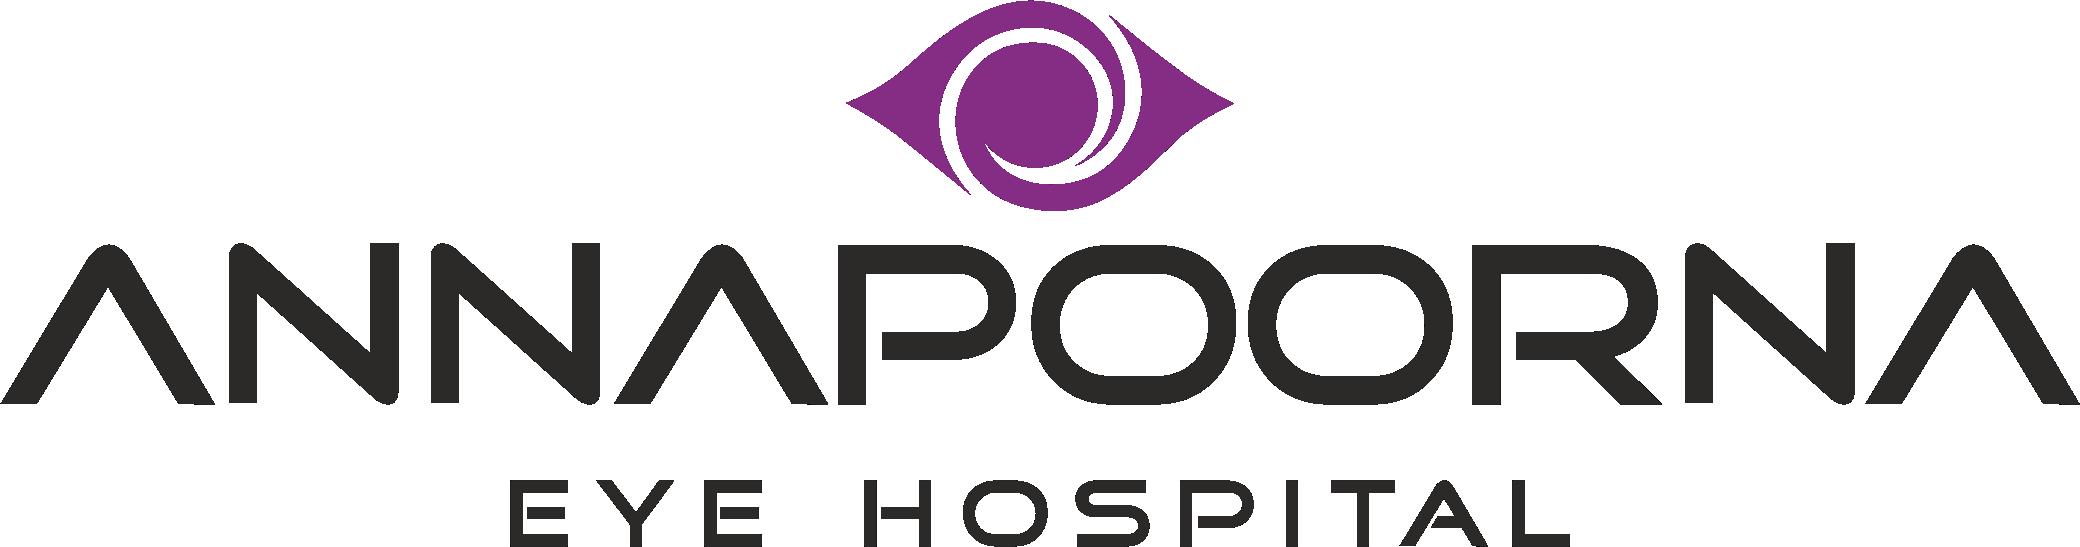 Annapoorna Eye Hospital